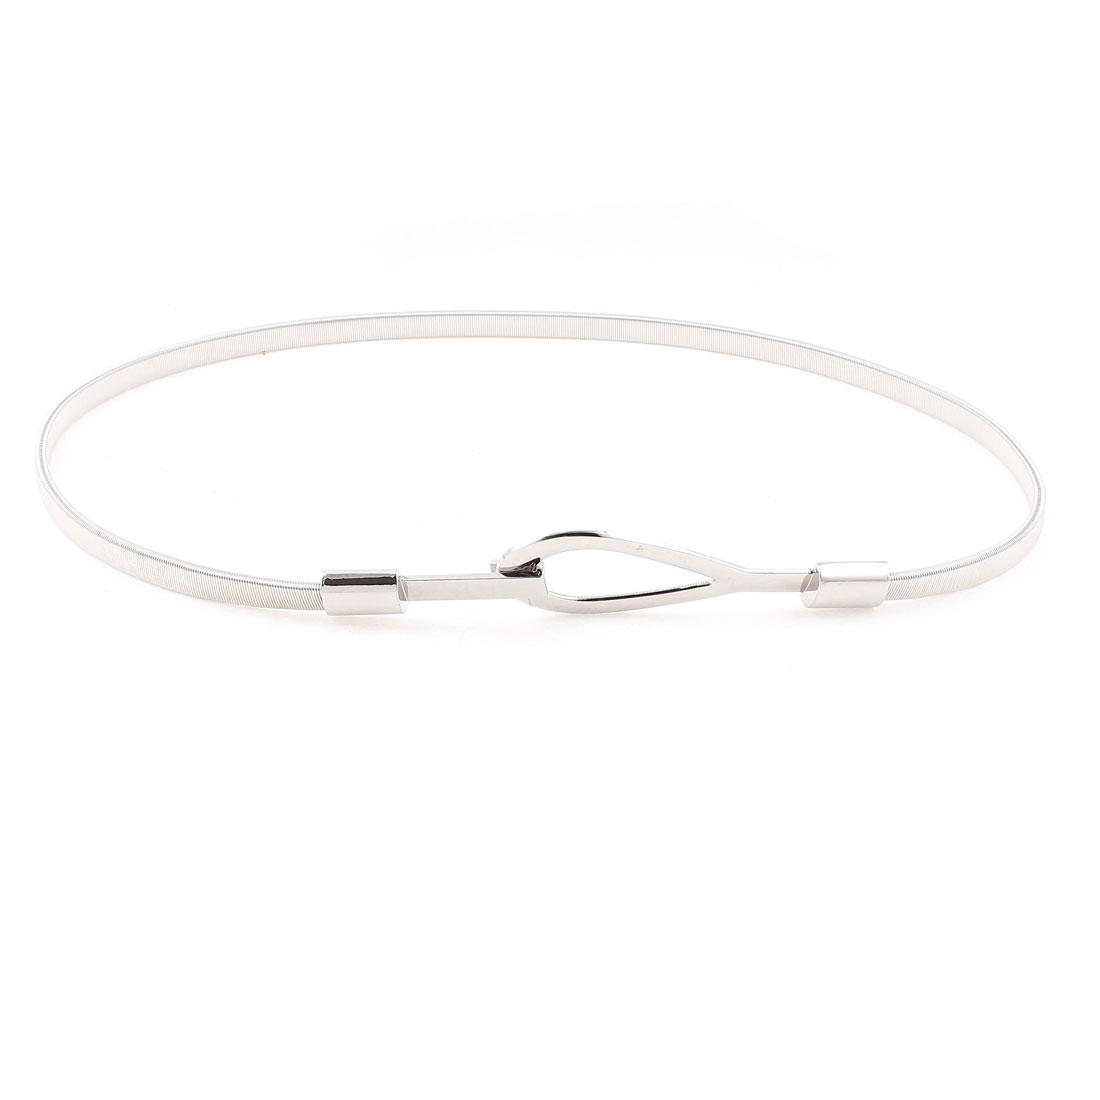 Interlocking Buckle Slim Waistband Waist Chain Silver Tone for Women